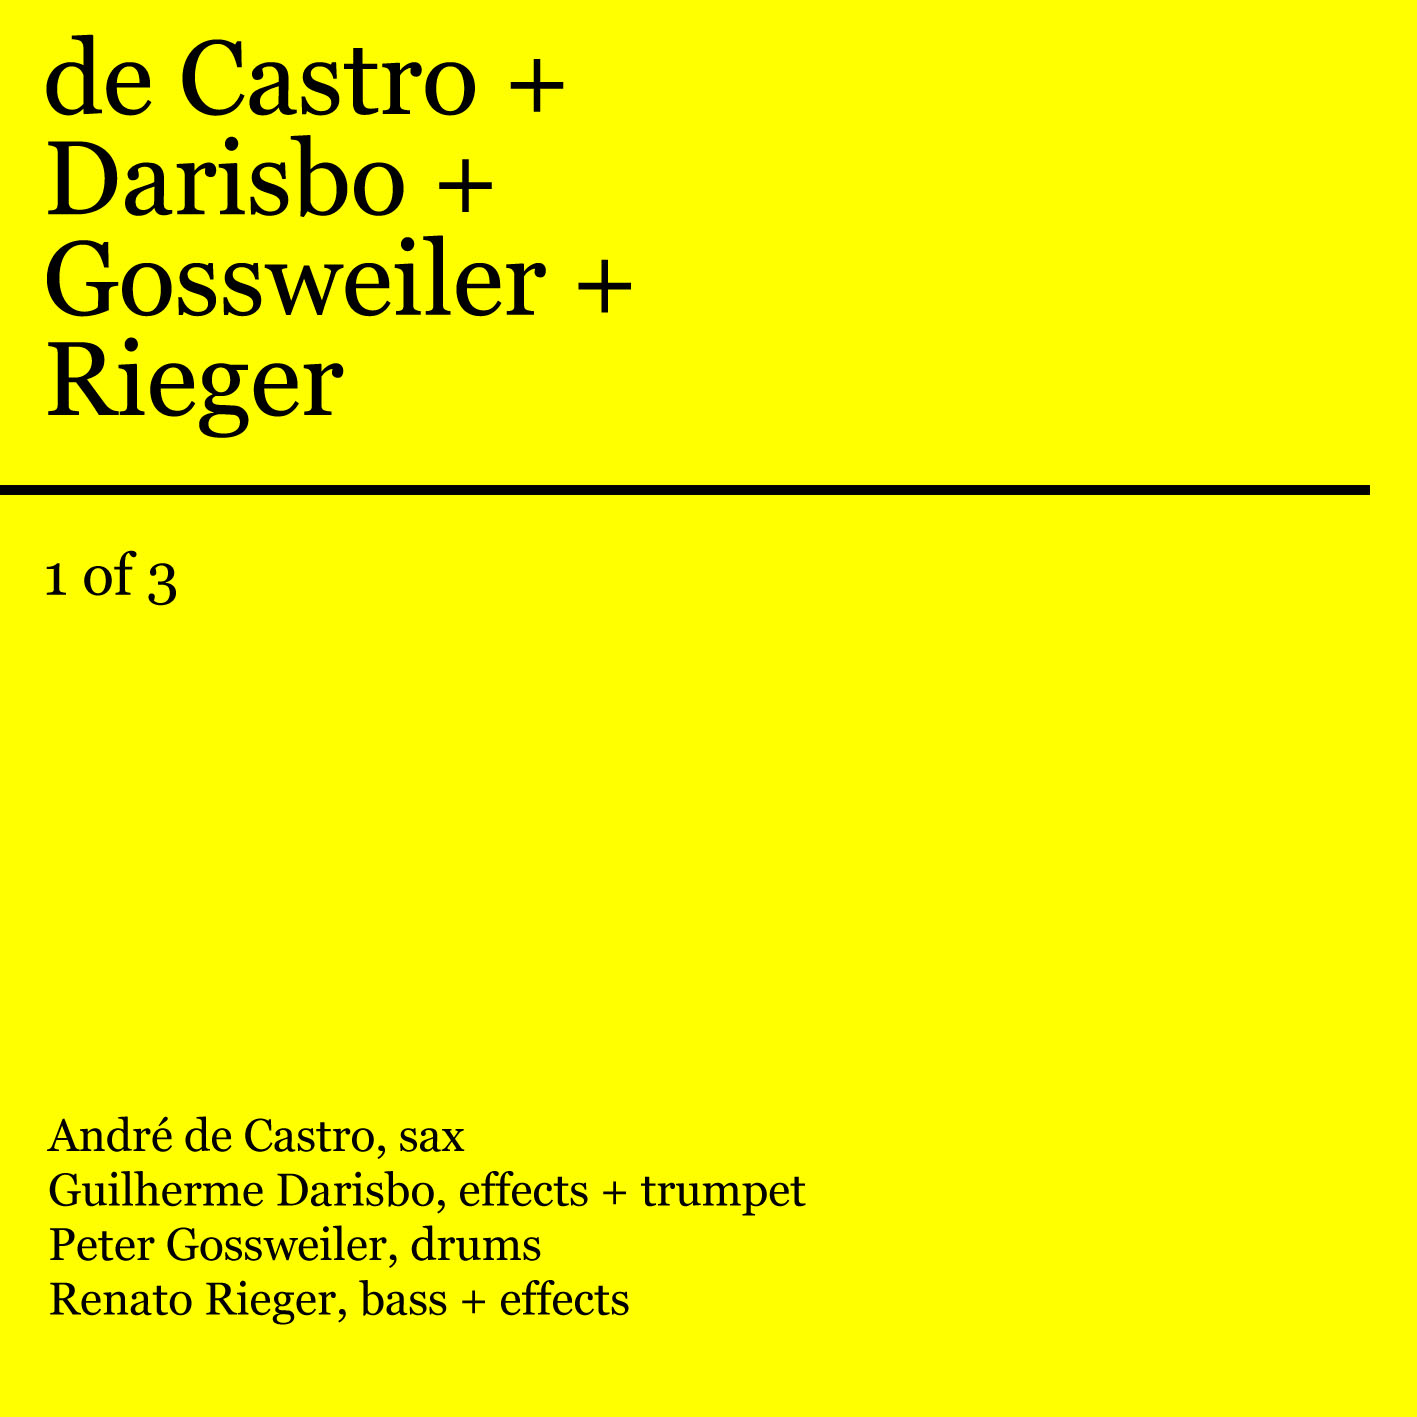 MSRCD027 - de Castro + Darisbo + Gossweiler + Rieger, 28 december 2012, 1 of 3